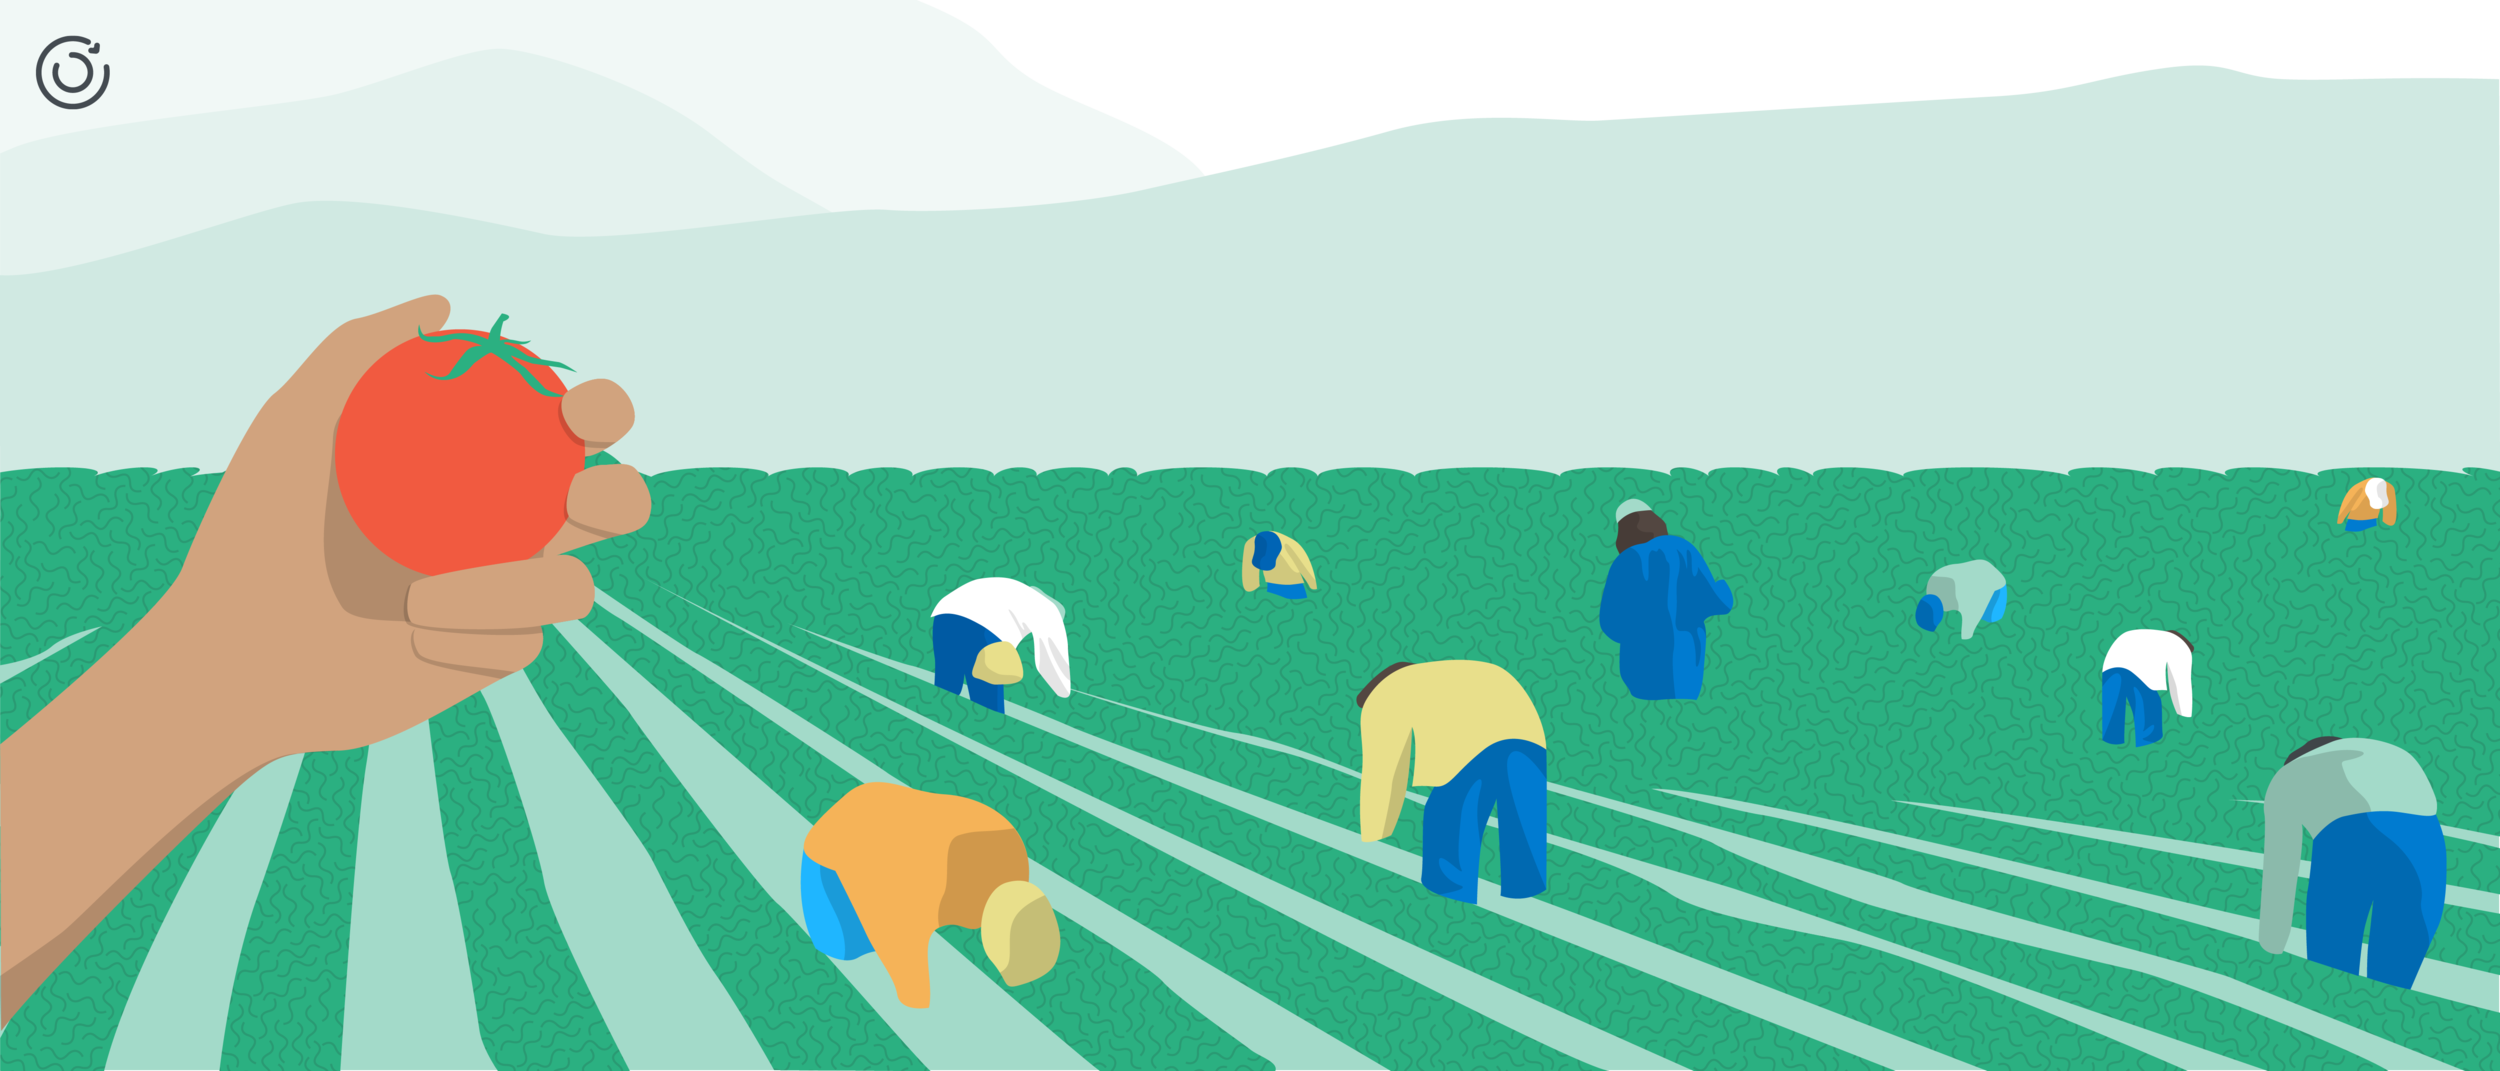 190609_farm-labor.png